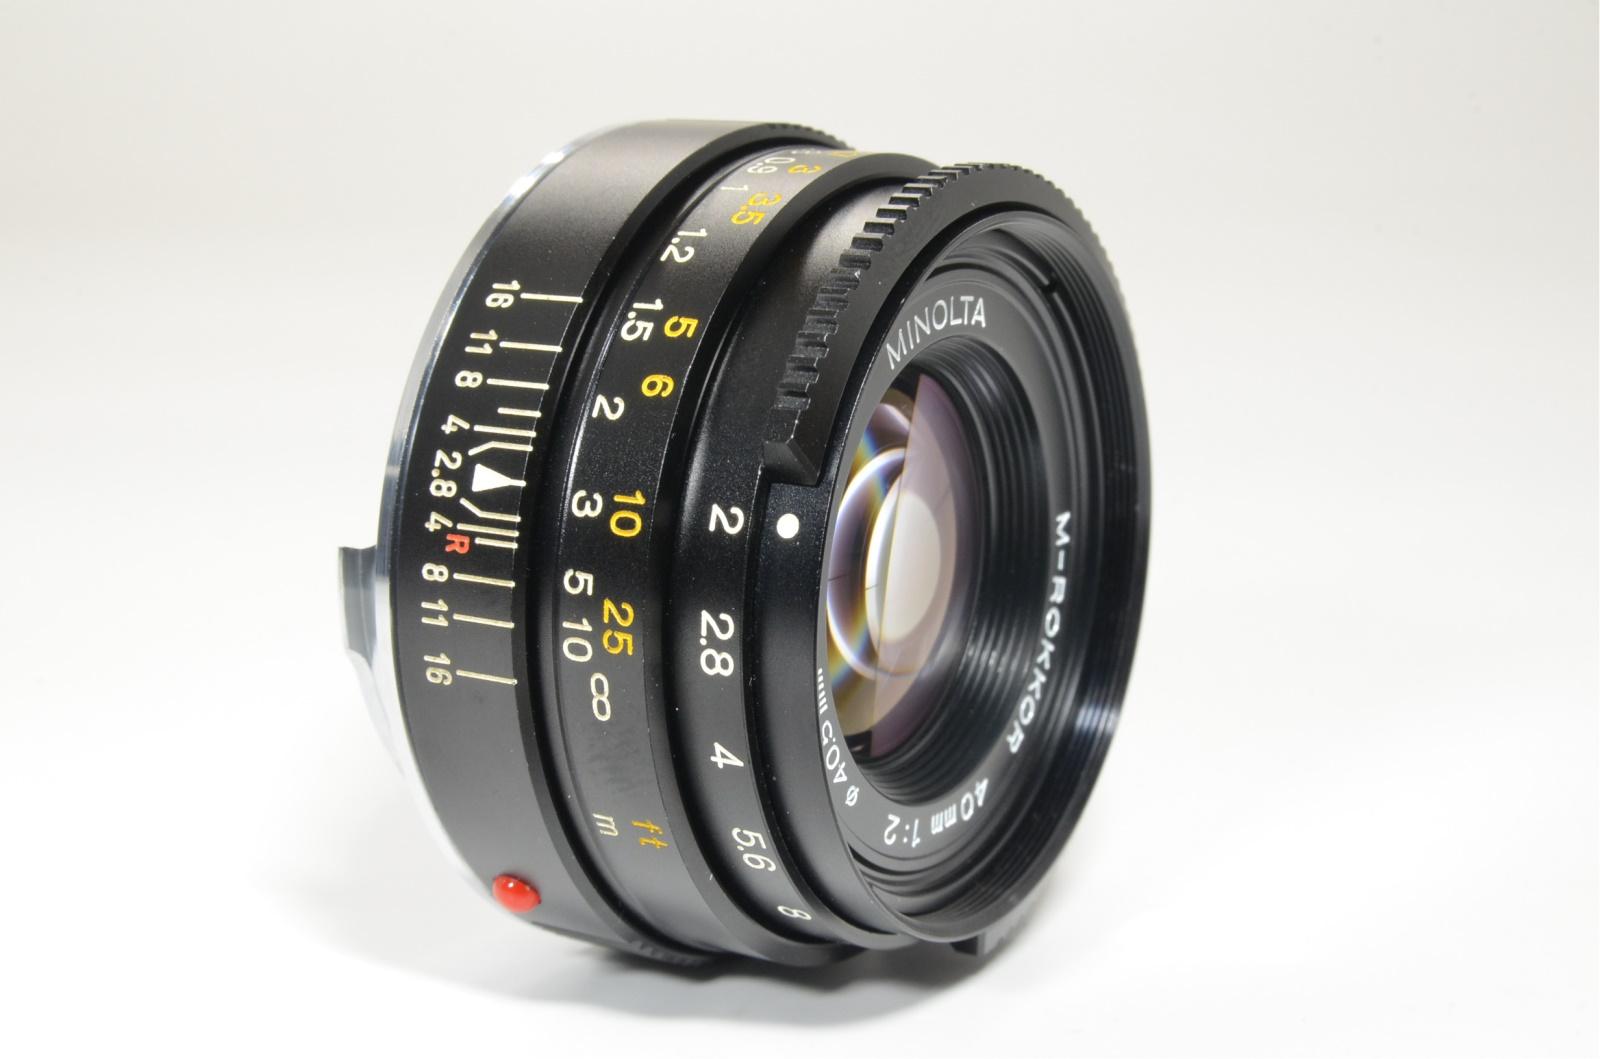 minolta cle film camera, m-rokkor lens 40mm, 90mm, flash, grip, shooting tested